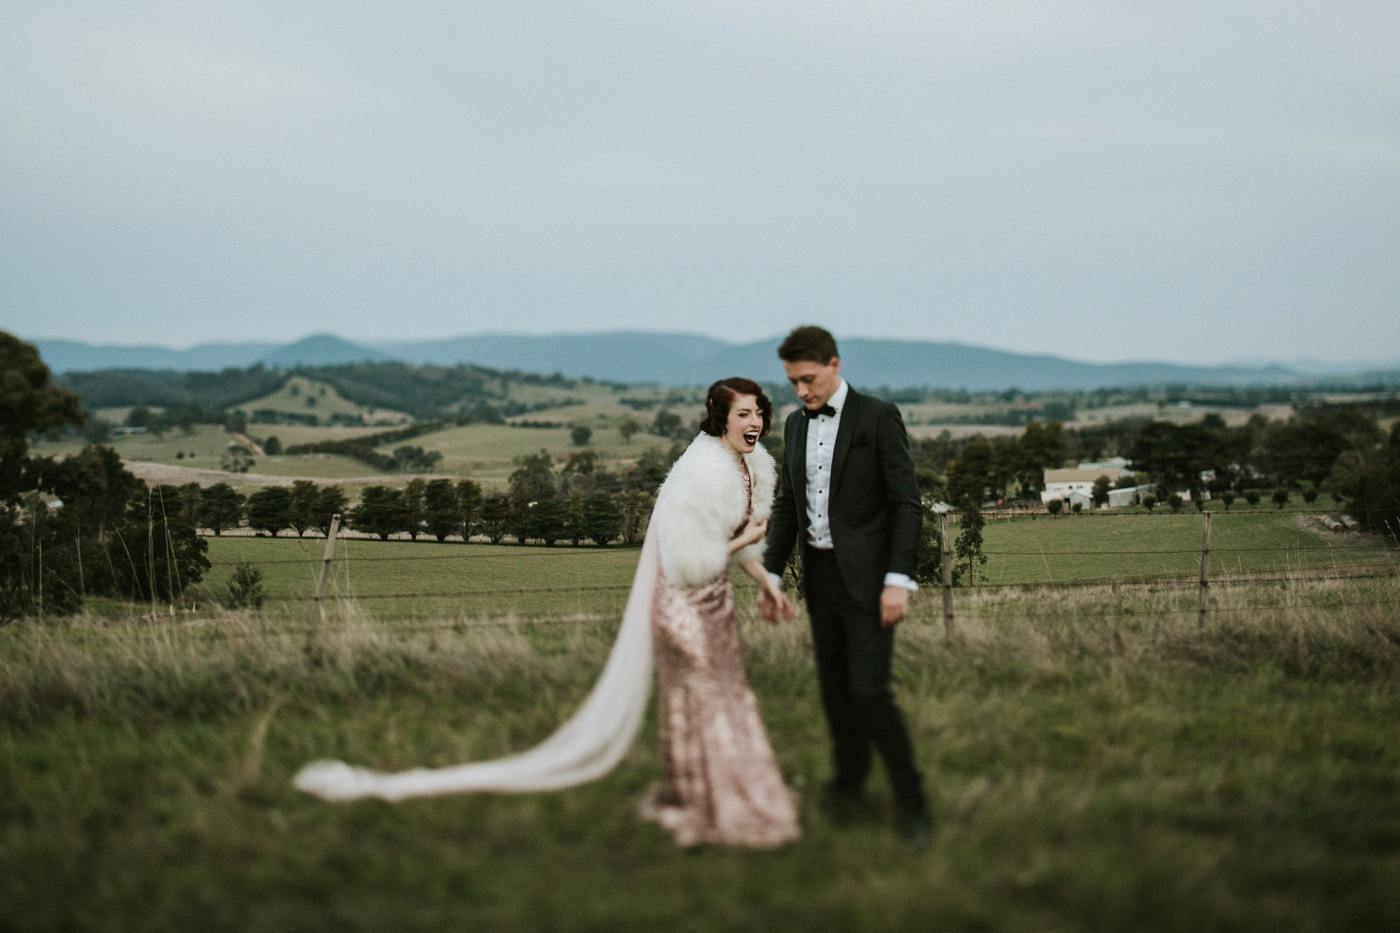 Emma&Morgan_Melbourne-Vintage-Elegant-Fun-Quirky-Yarra-Valley-Vineyard-Wedding_Melbourne-Wedding-Photography-79